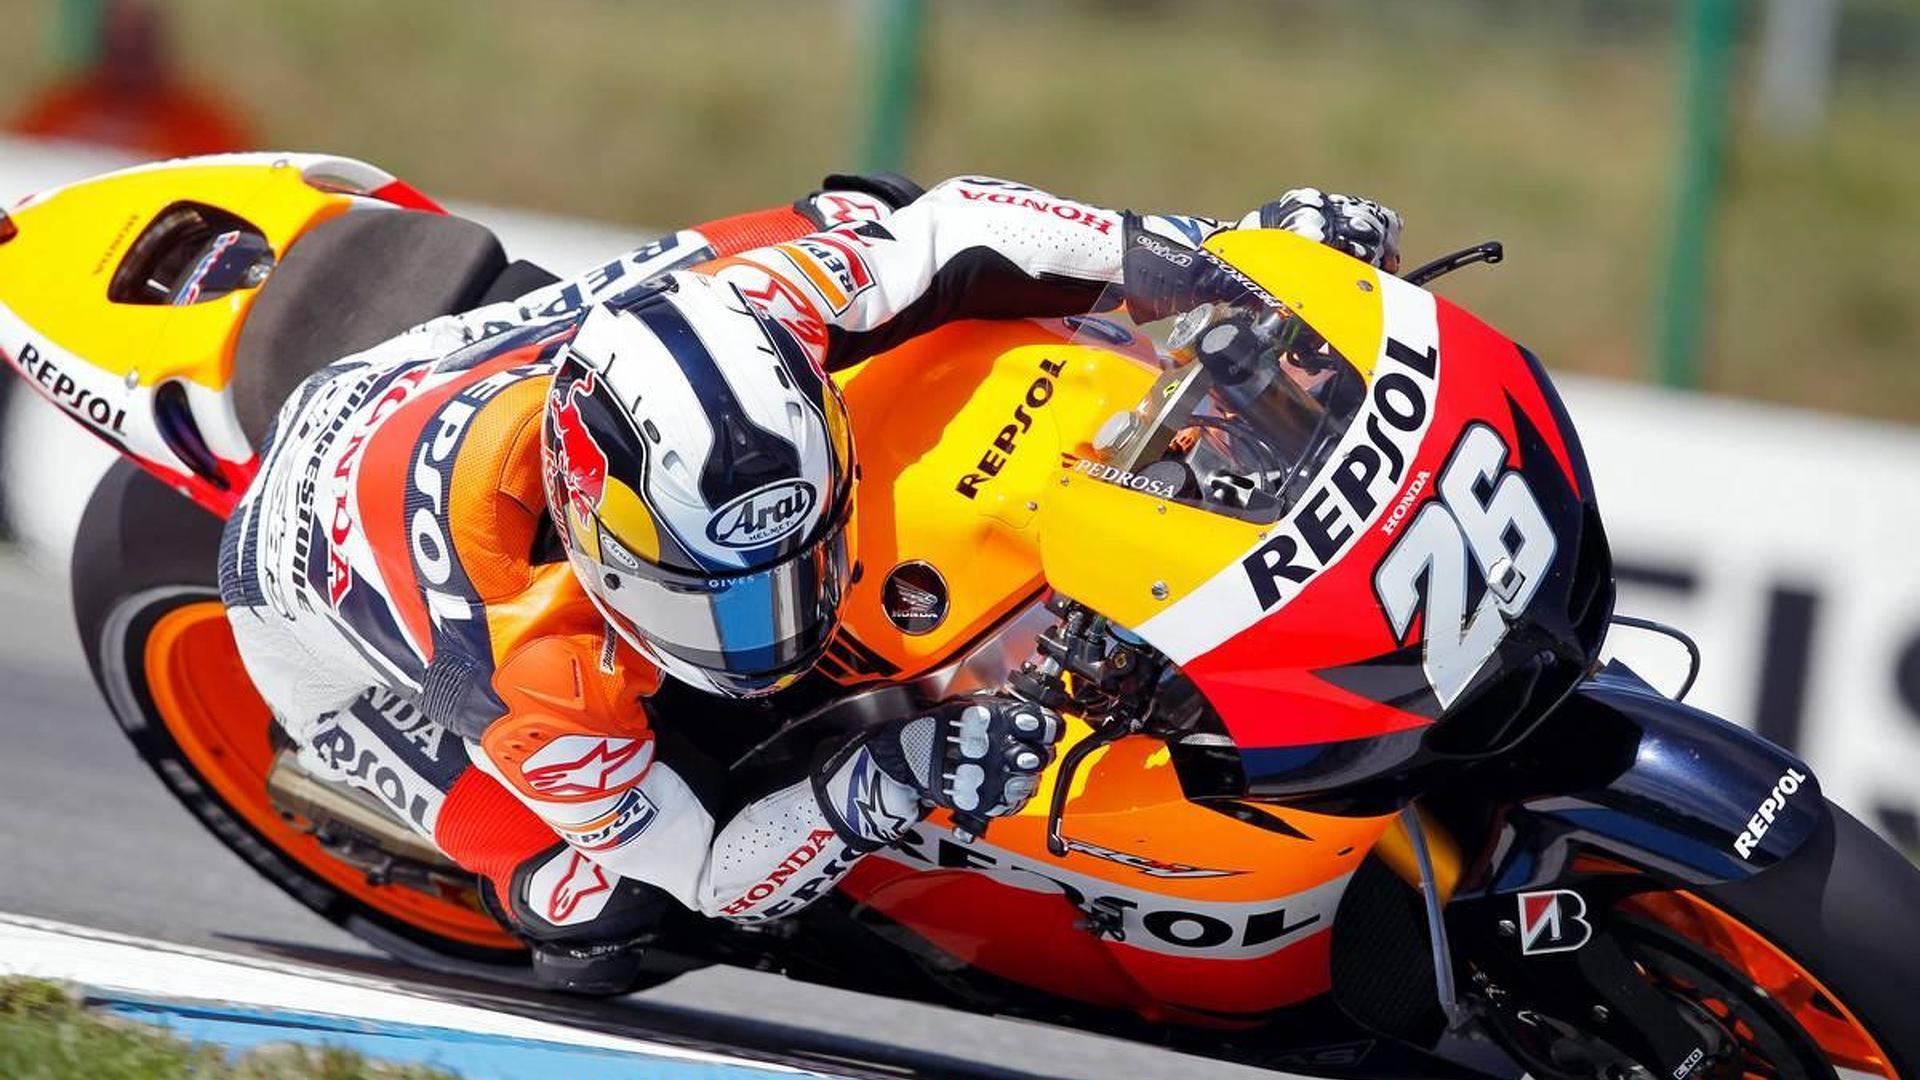 India GP track eyes 2012 MotoGP race